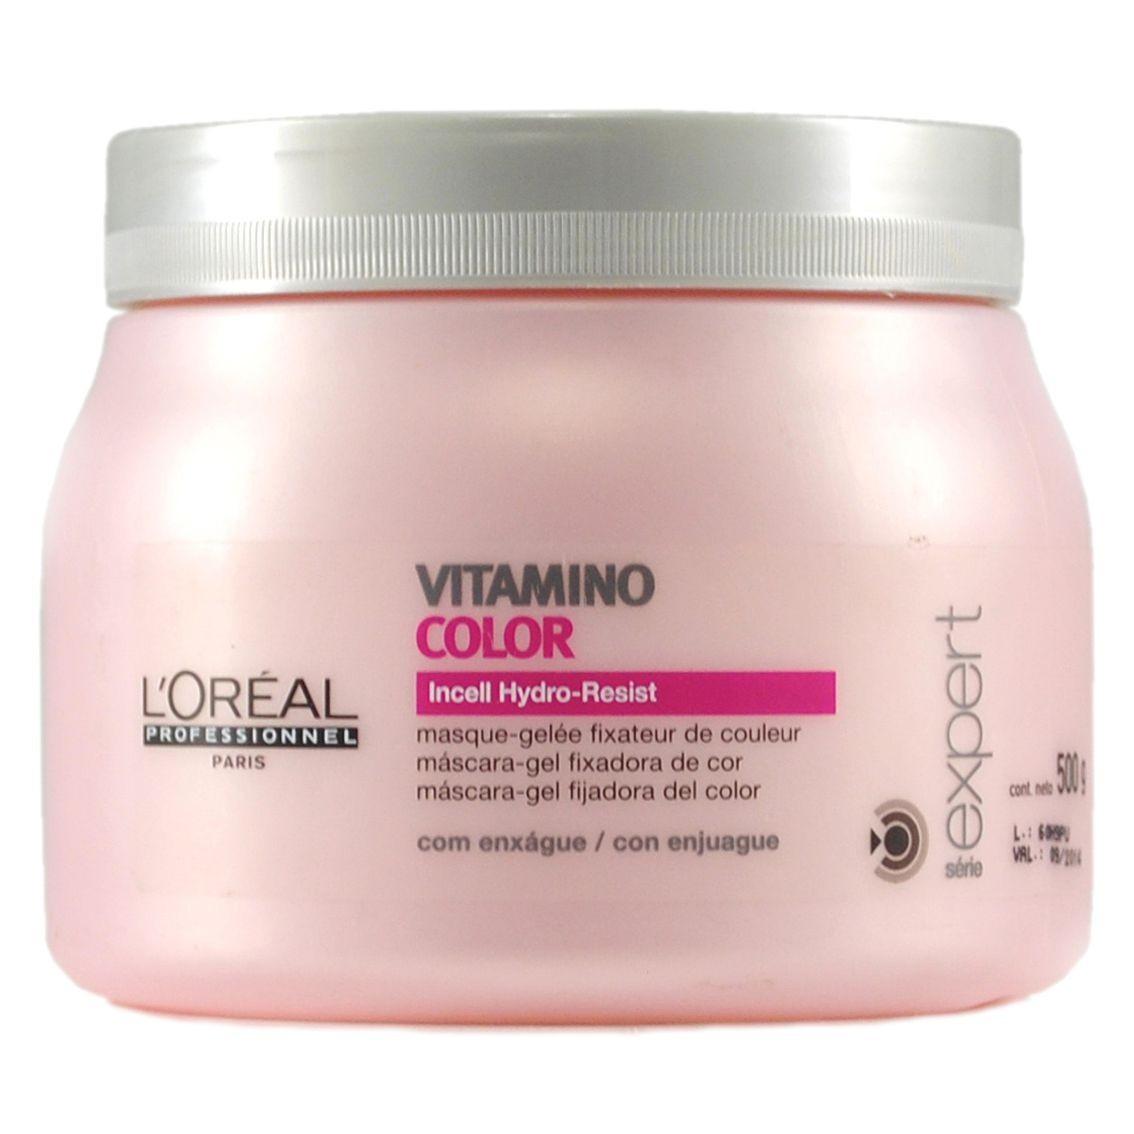 Loreal Professionnel Expert Vitamino Color A.OX - Máscara Capilar 500ml - CA